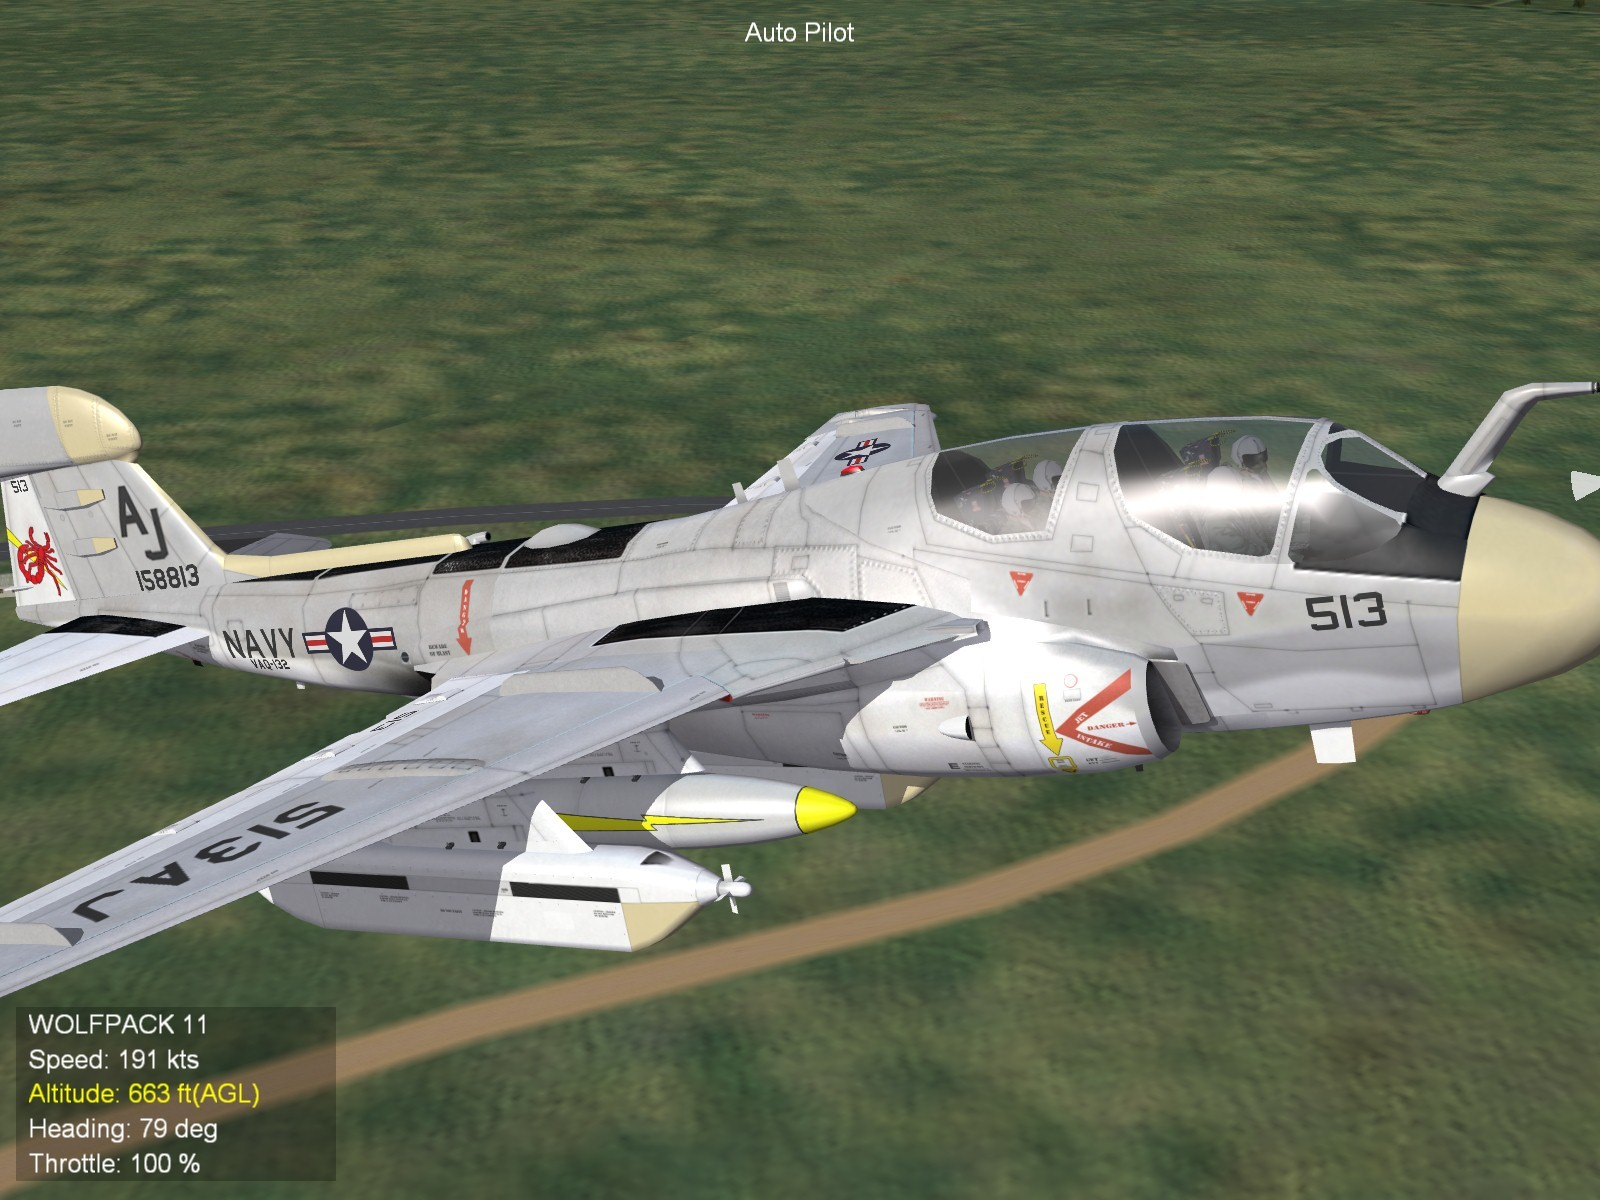 A-6 Superpack - A-6 - CombatACE